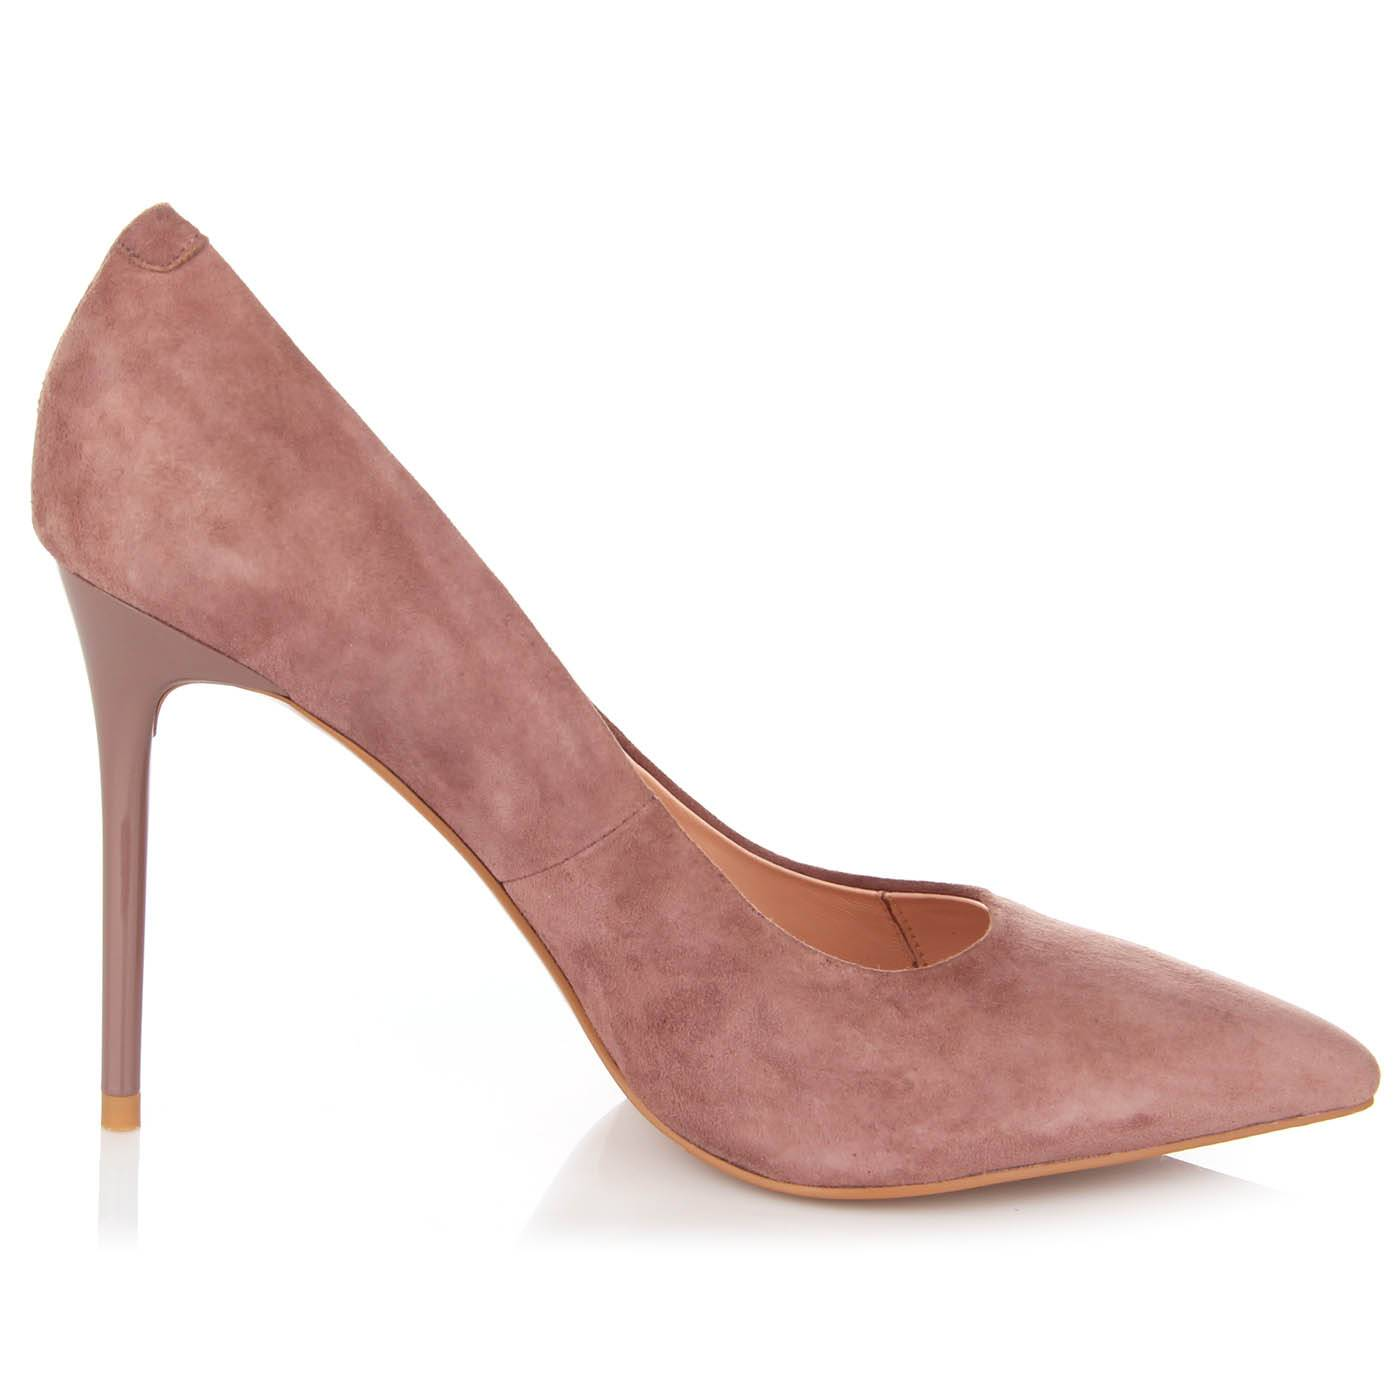 Туфлі жіночі ditto 6923 Коричневий купить по выгодной цене в ... 43ccf9dcd54be